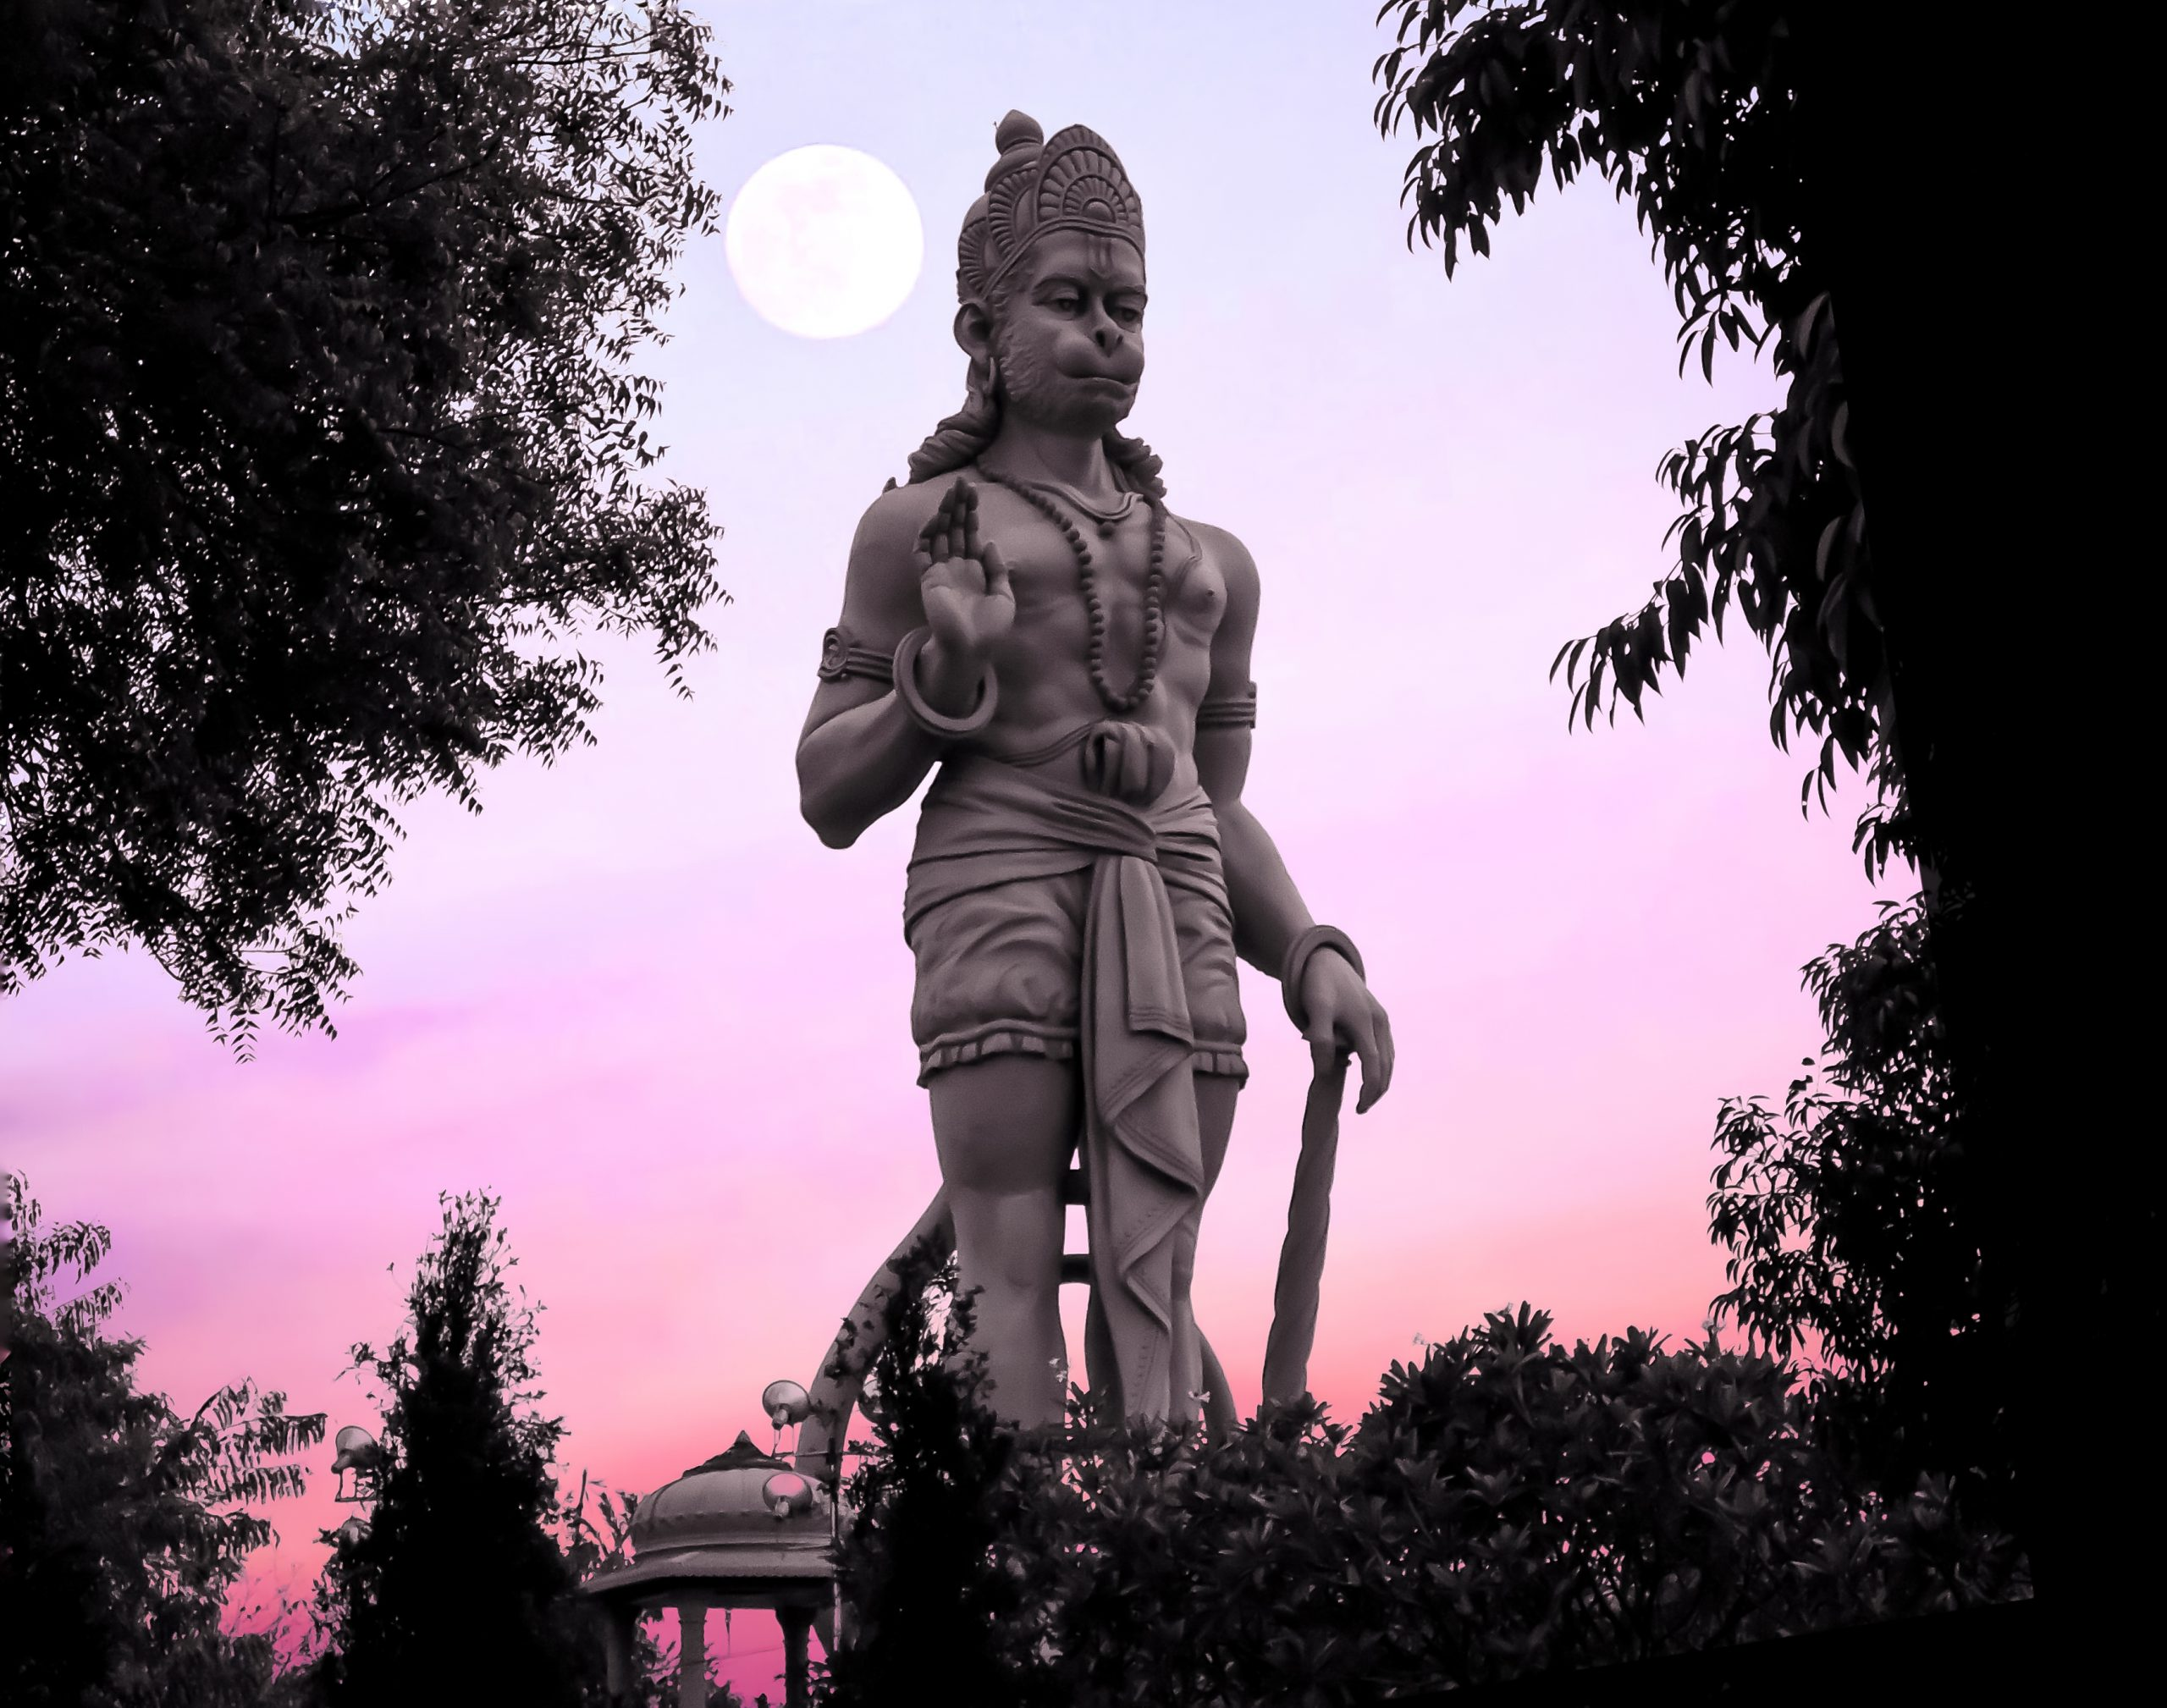 Statue of Lord Hanuman